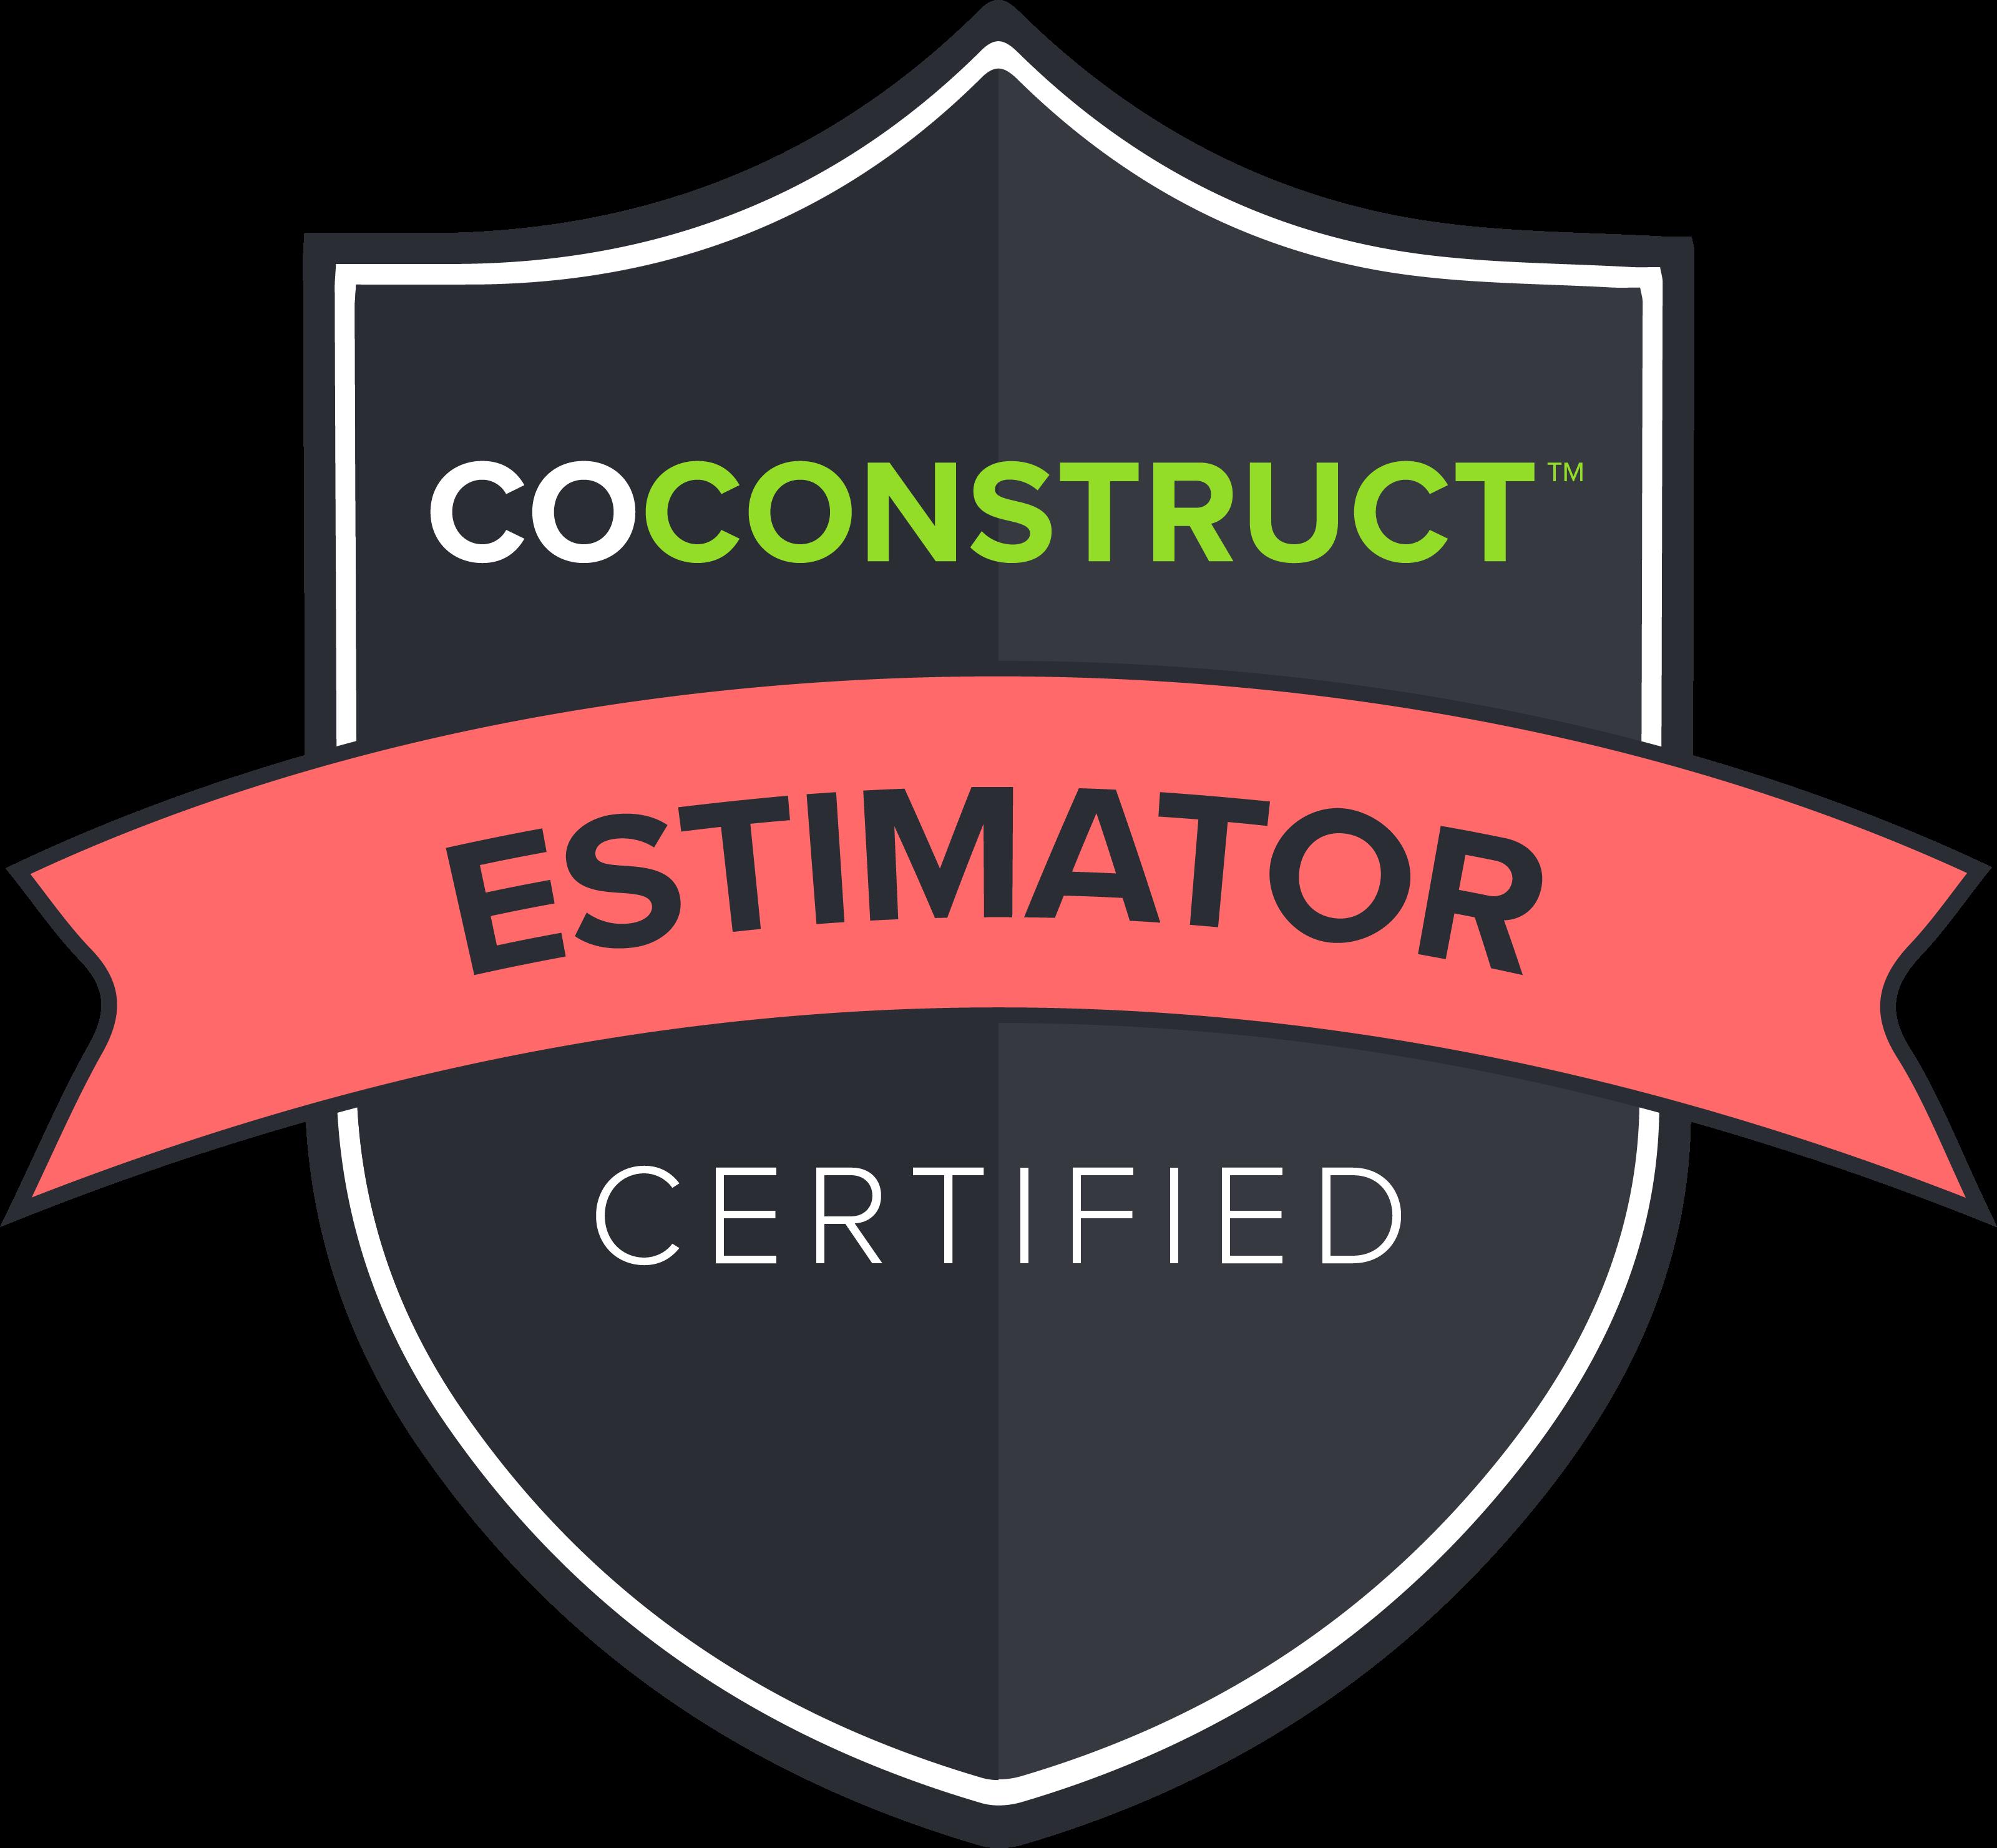 CoConstruct Estimator Badge